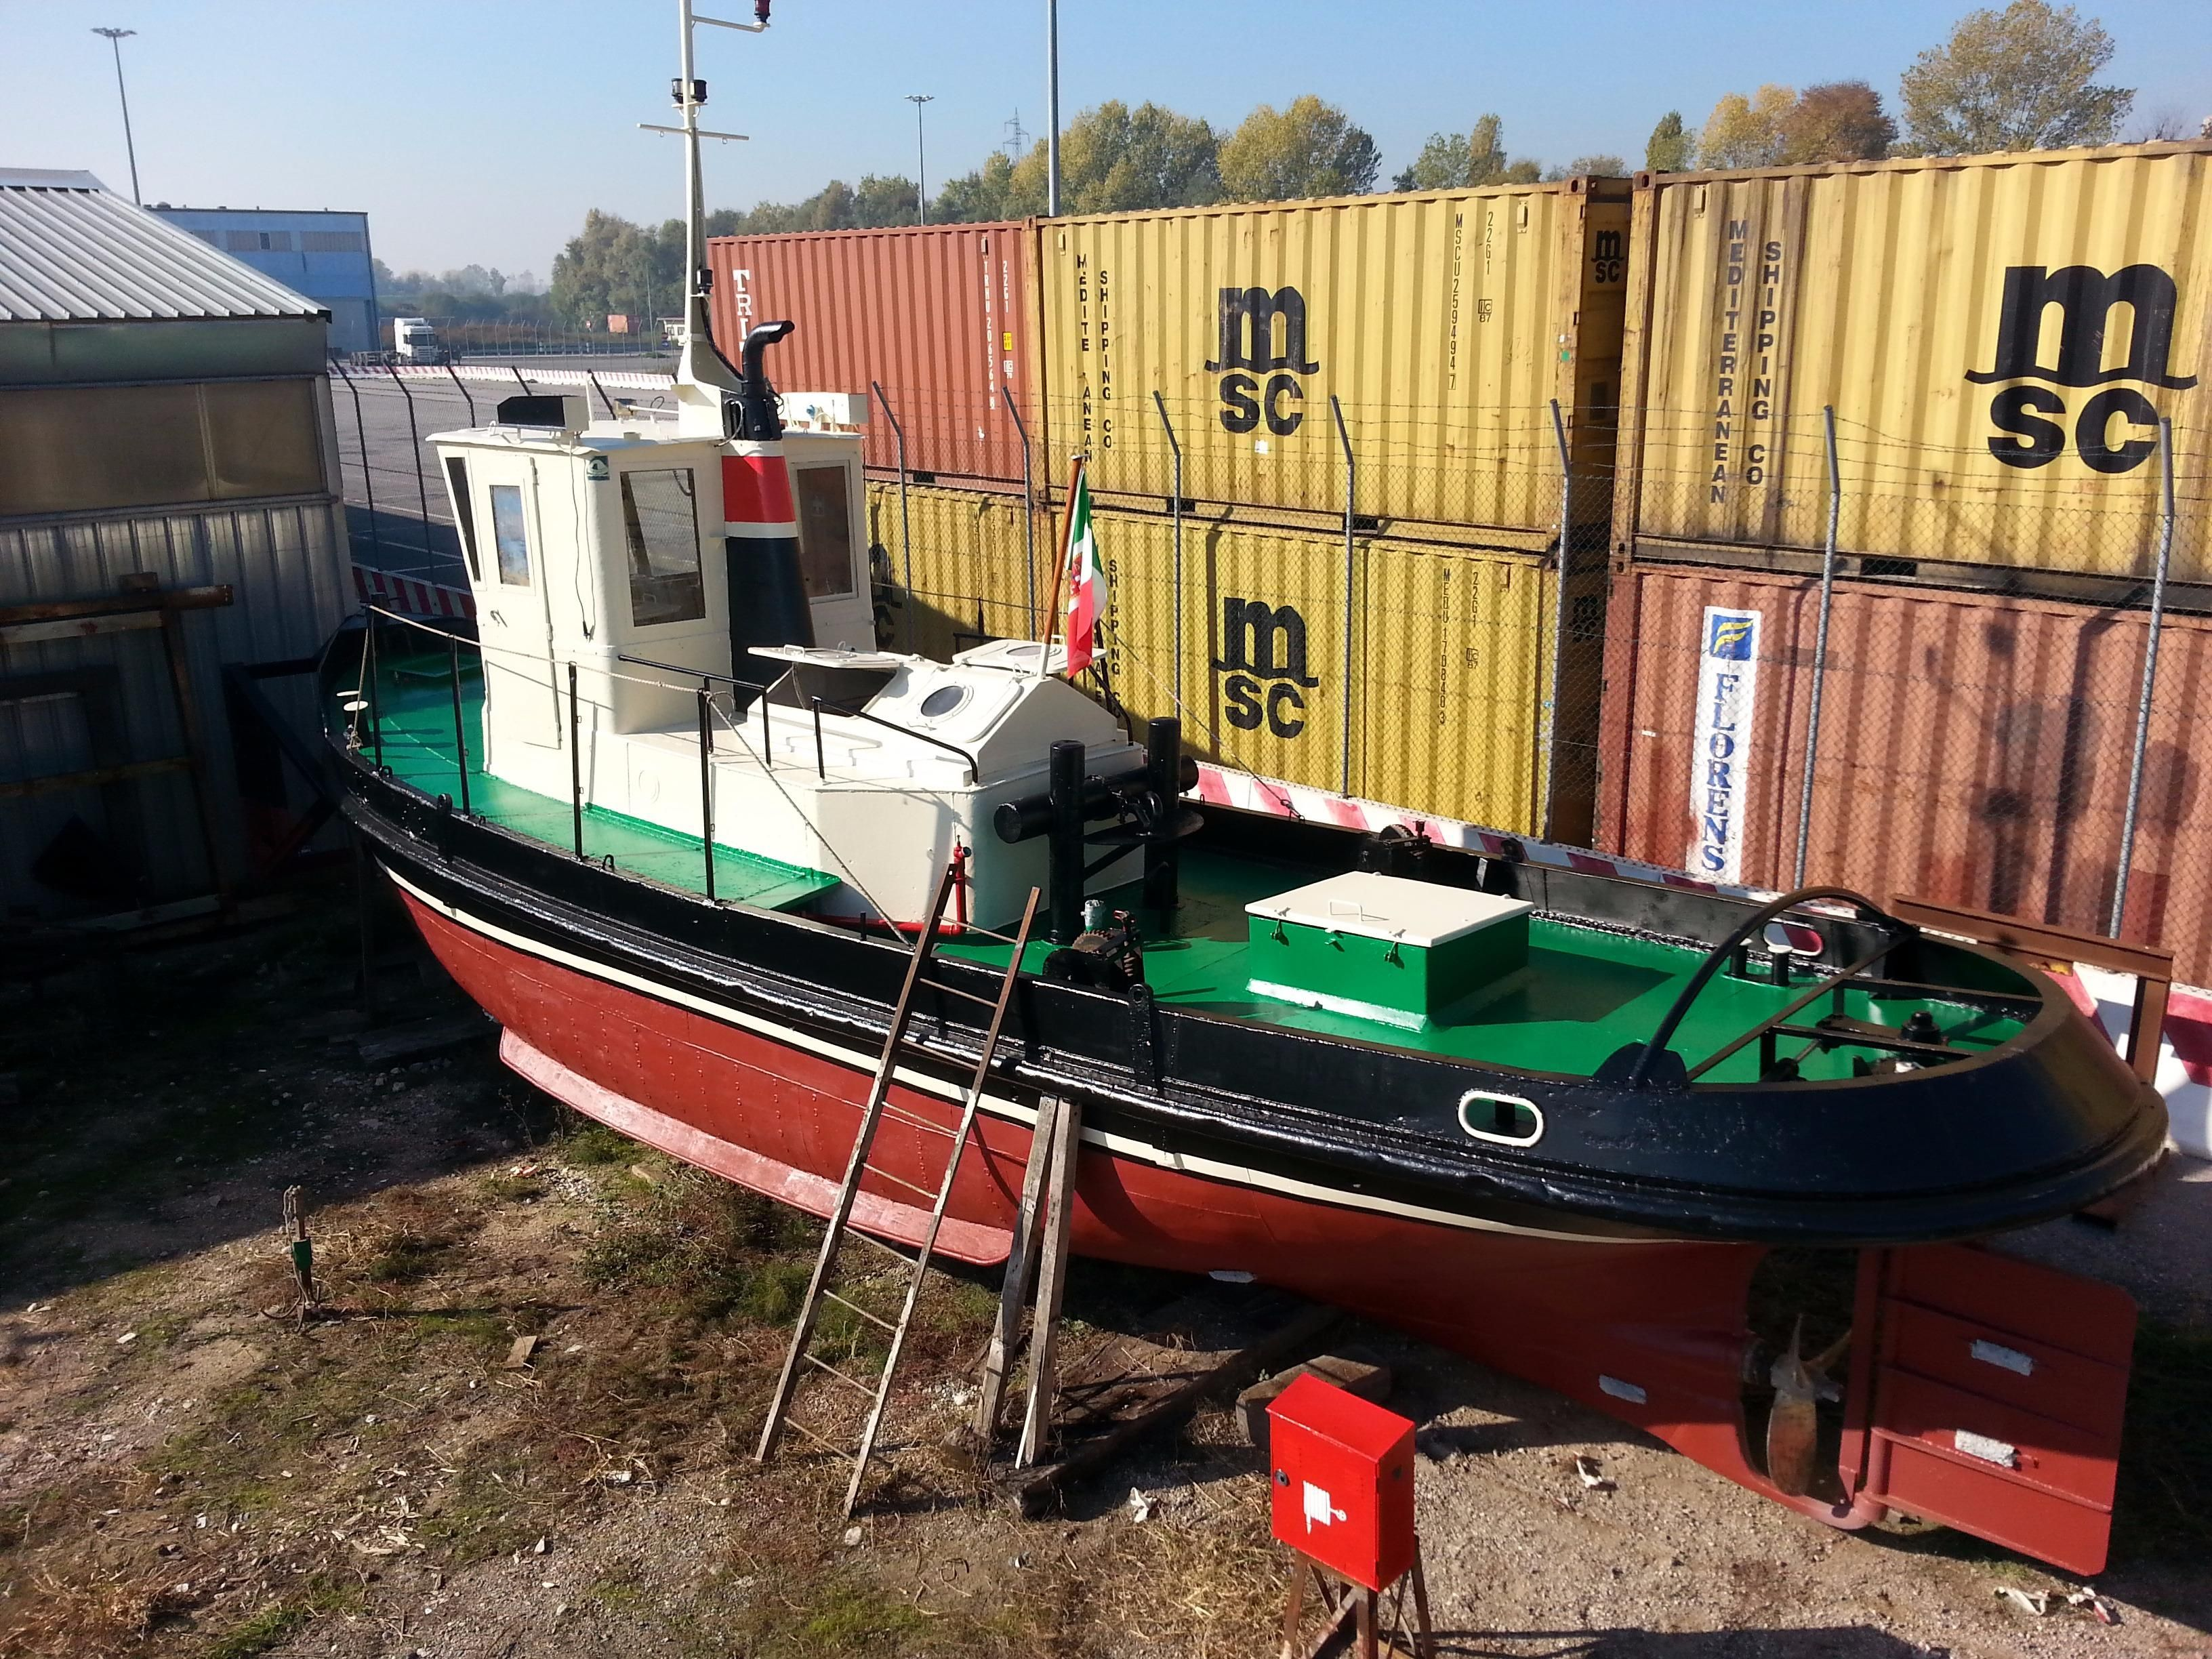 1927 gidkoogk amsterdam tug power boat for sale www for Houseboat amsterdam prezzi